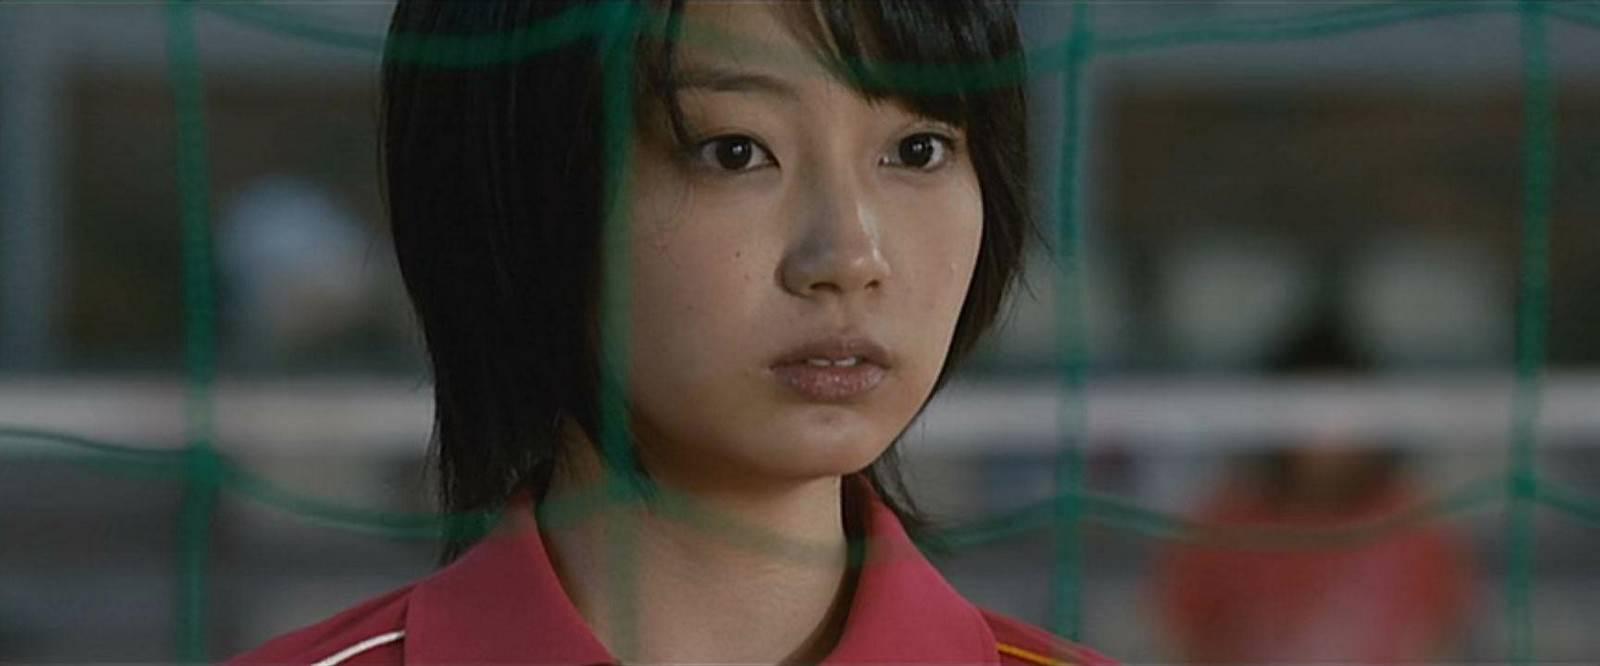 Movie, 桐島、部活やめるってよ(日本, 2012年) / 聽說桐島退社了(台灣) / 聽說桐島要退社(香港) / The Kirishima Thing(英文) / 听说桐岛要退部(網路), 電影角色與演員介紹